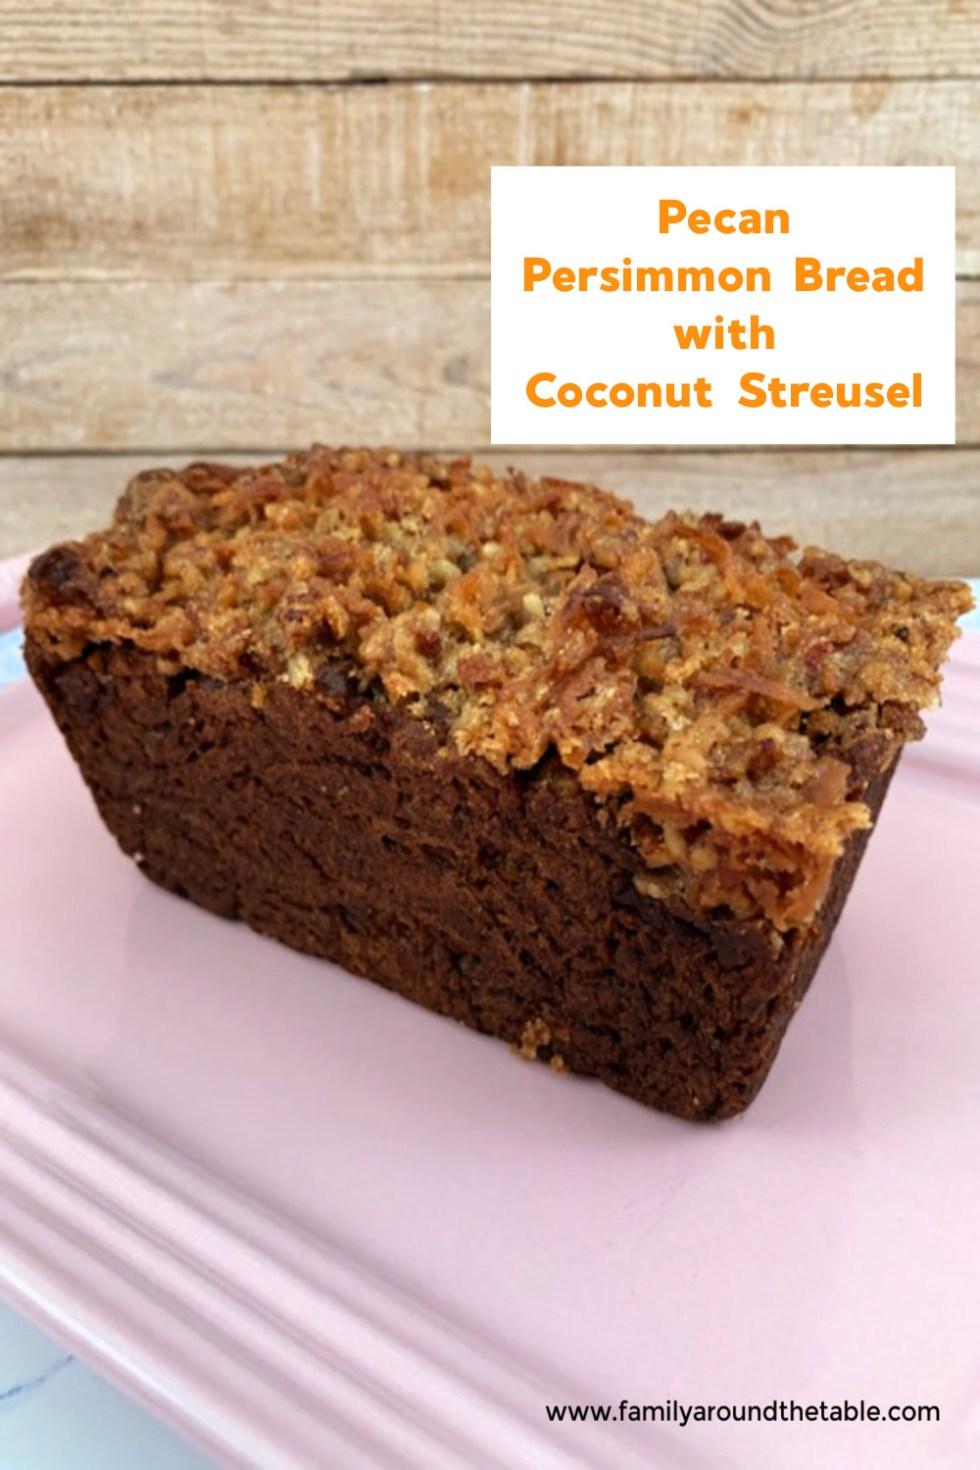 Pecan persimmon bread with coconut streusel Pinterest image.